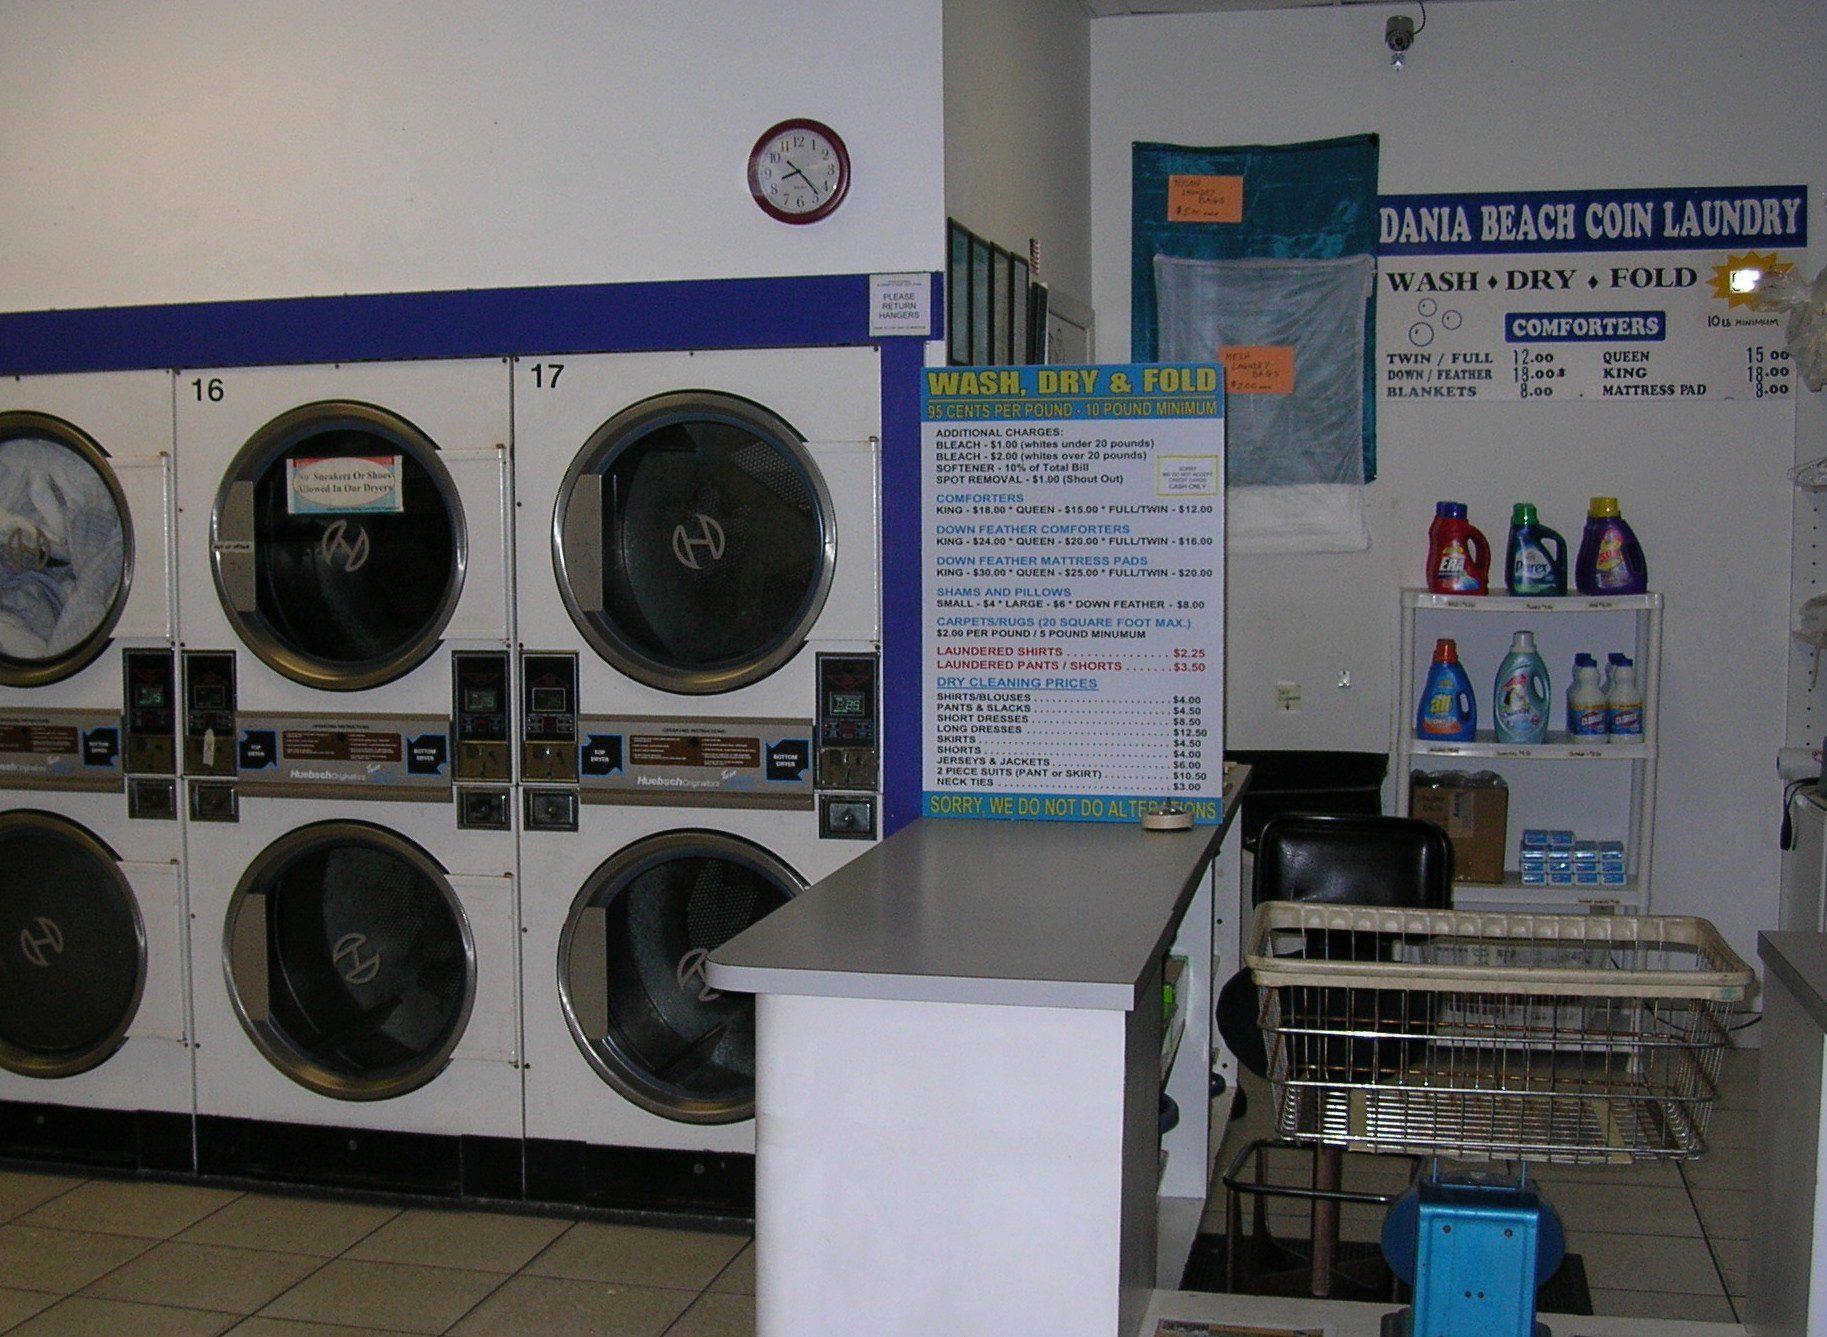 Dania Beach Coin Laundry 358 E Dania Beach Blvd Dania Fl 33004